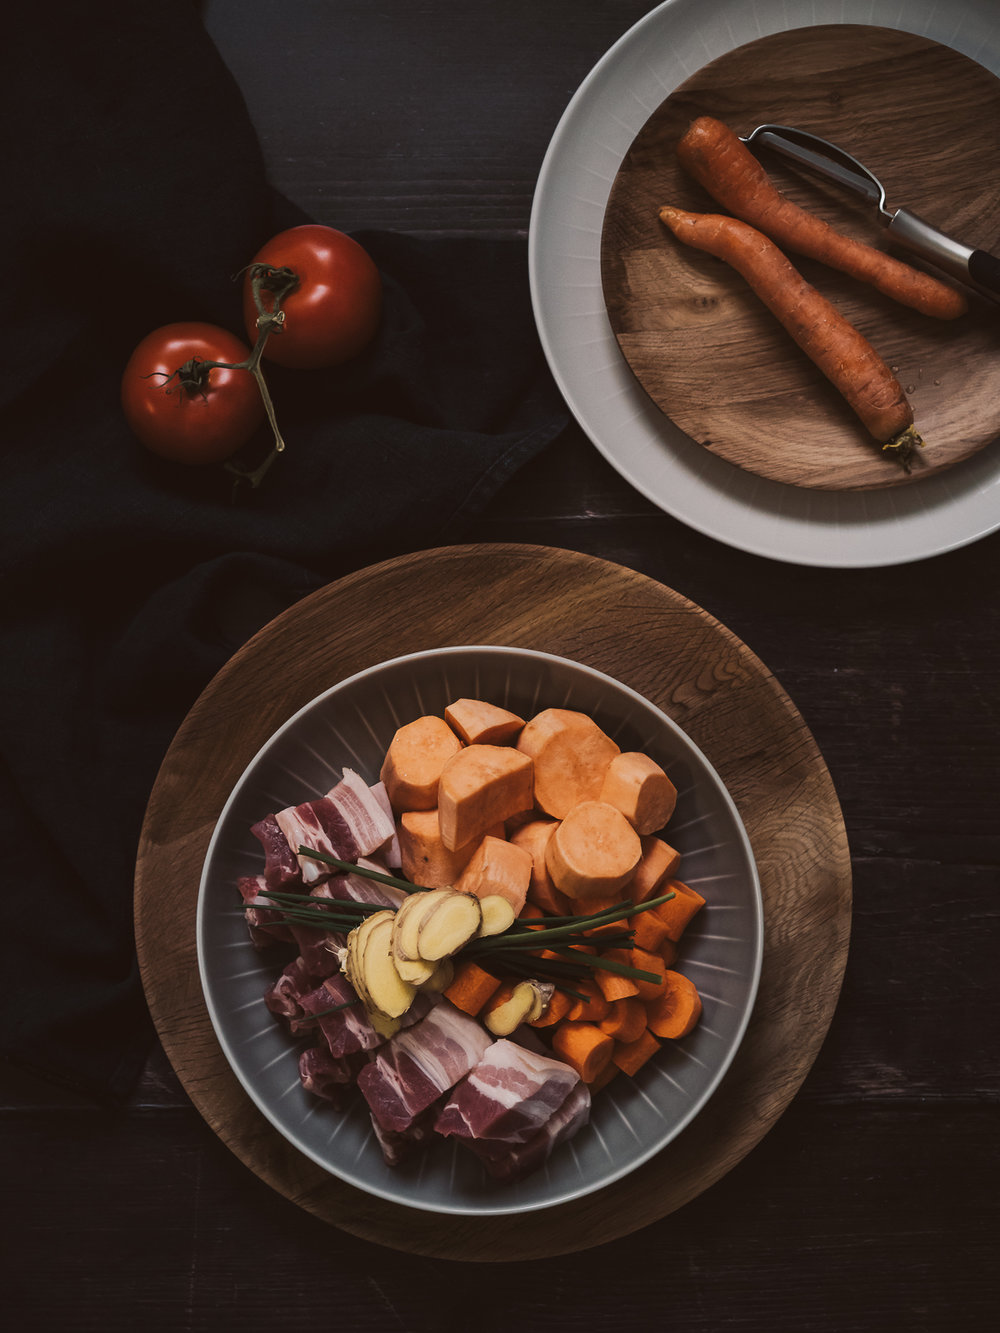 Ingolstadt Village Chinese New Year Lifestyle Shopping & Home Cooking - Olympus EM1Markii 2512 - Yes! Please Enjoy by Fanning Tseng-110.jpg